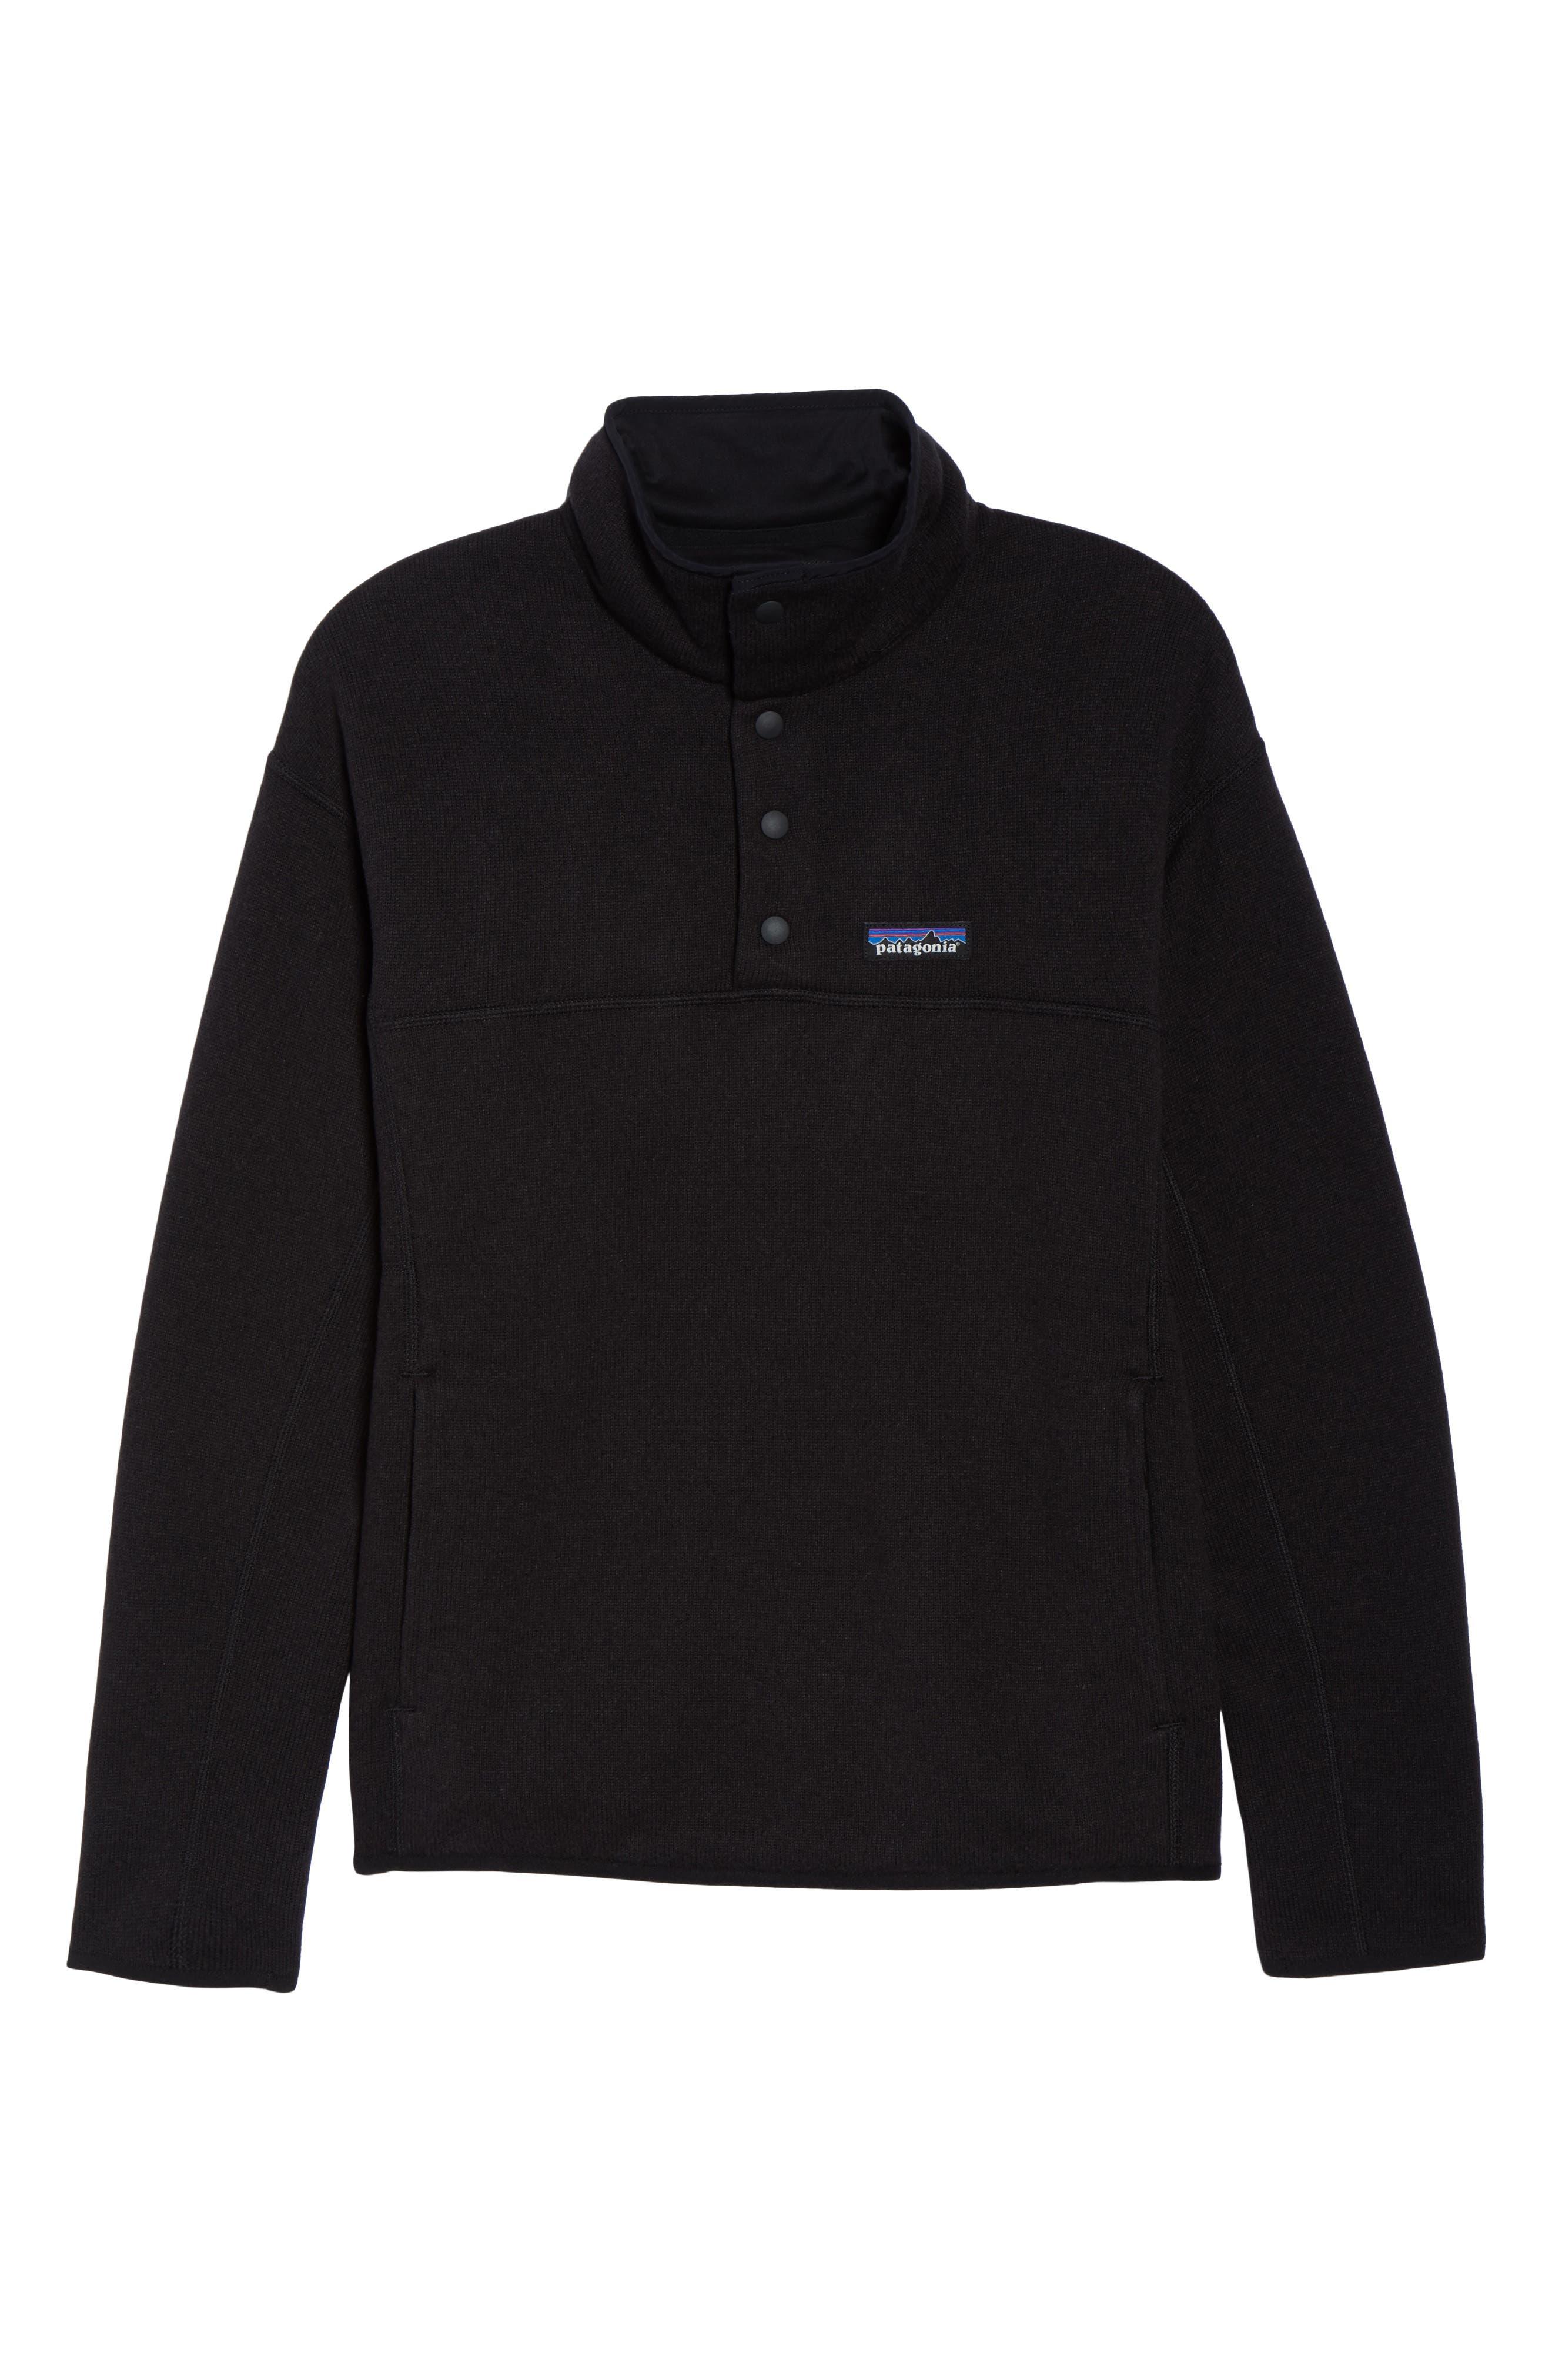 Lightweight Better Sweater Fleece,                             Alternate thumbnail 7, color,                             BLACK